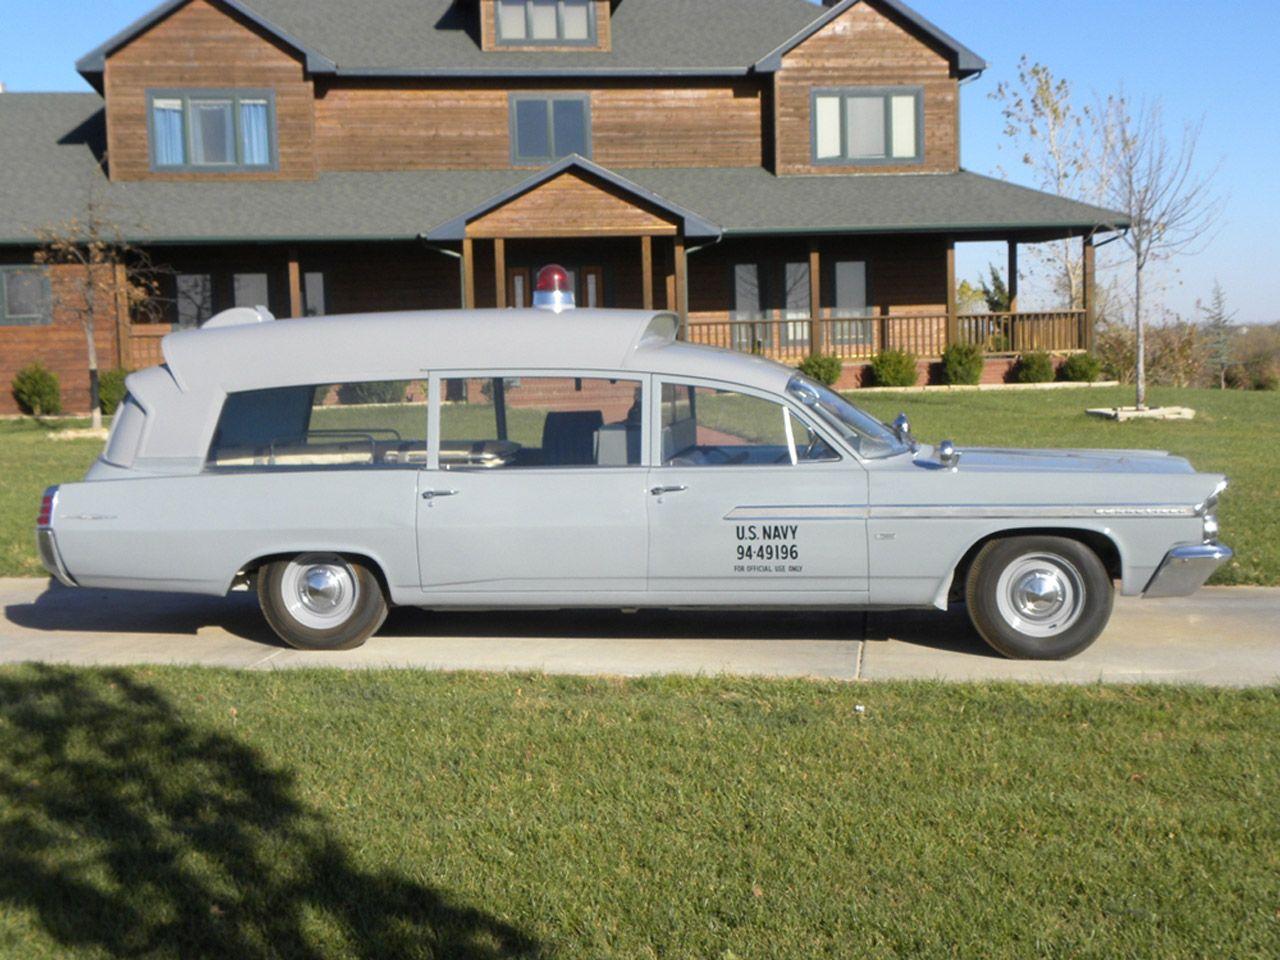 Pontiac Bonneville ambulancia U.S. NAVY de 1963 subastada  en Barret-Jackson Scottsale. Dicen que sirvio de coche funebre a John F. Kennedy.